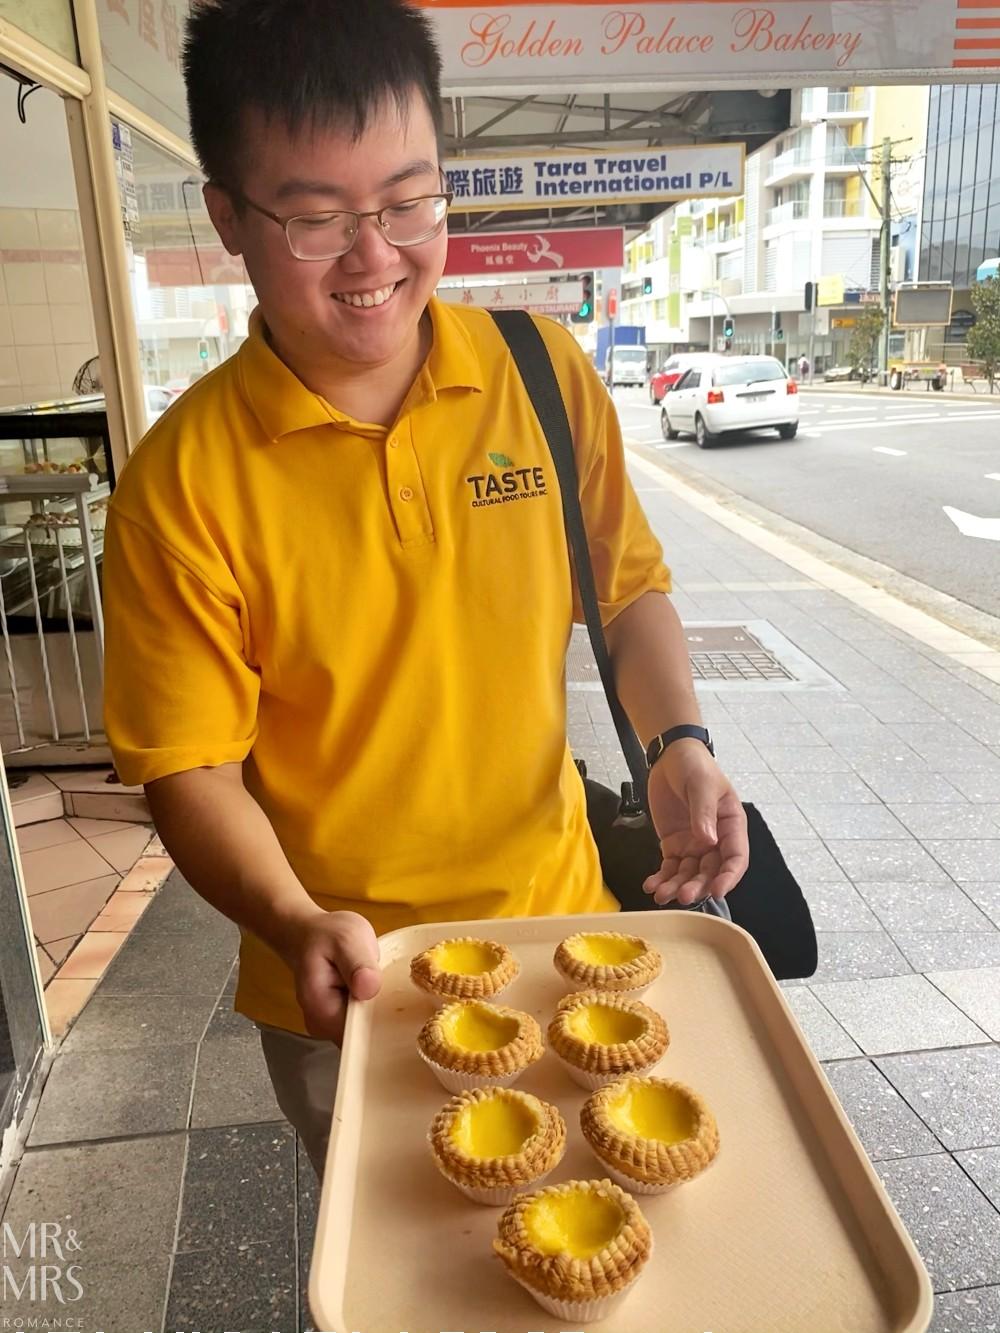 Hurstville food tour with Taste Cultural Food Tours - Patrick with custard tarts